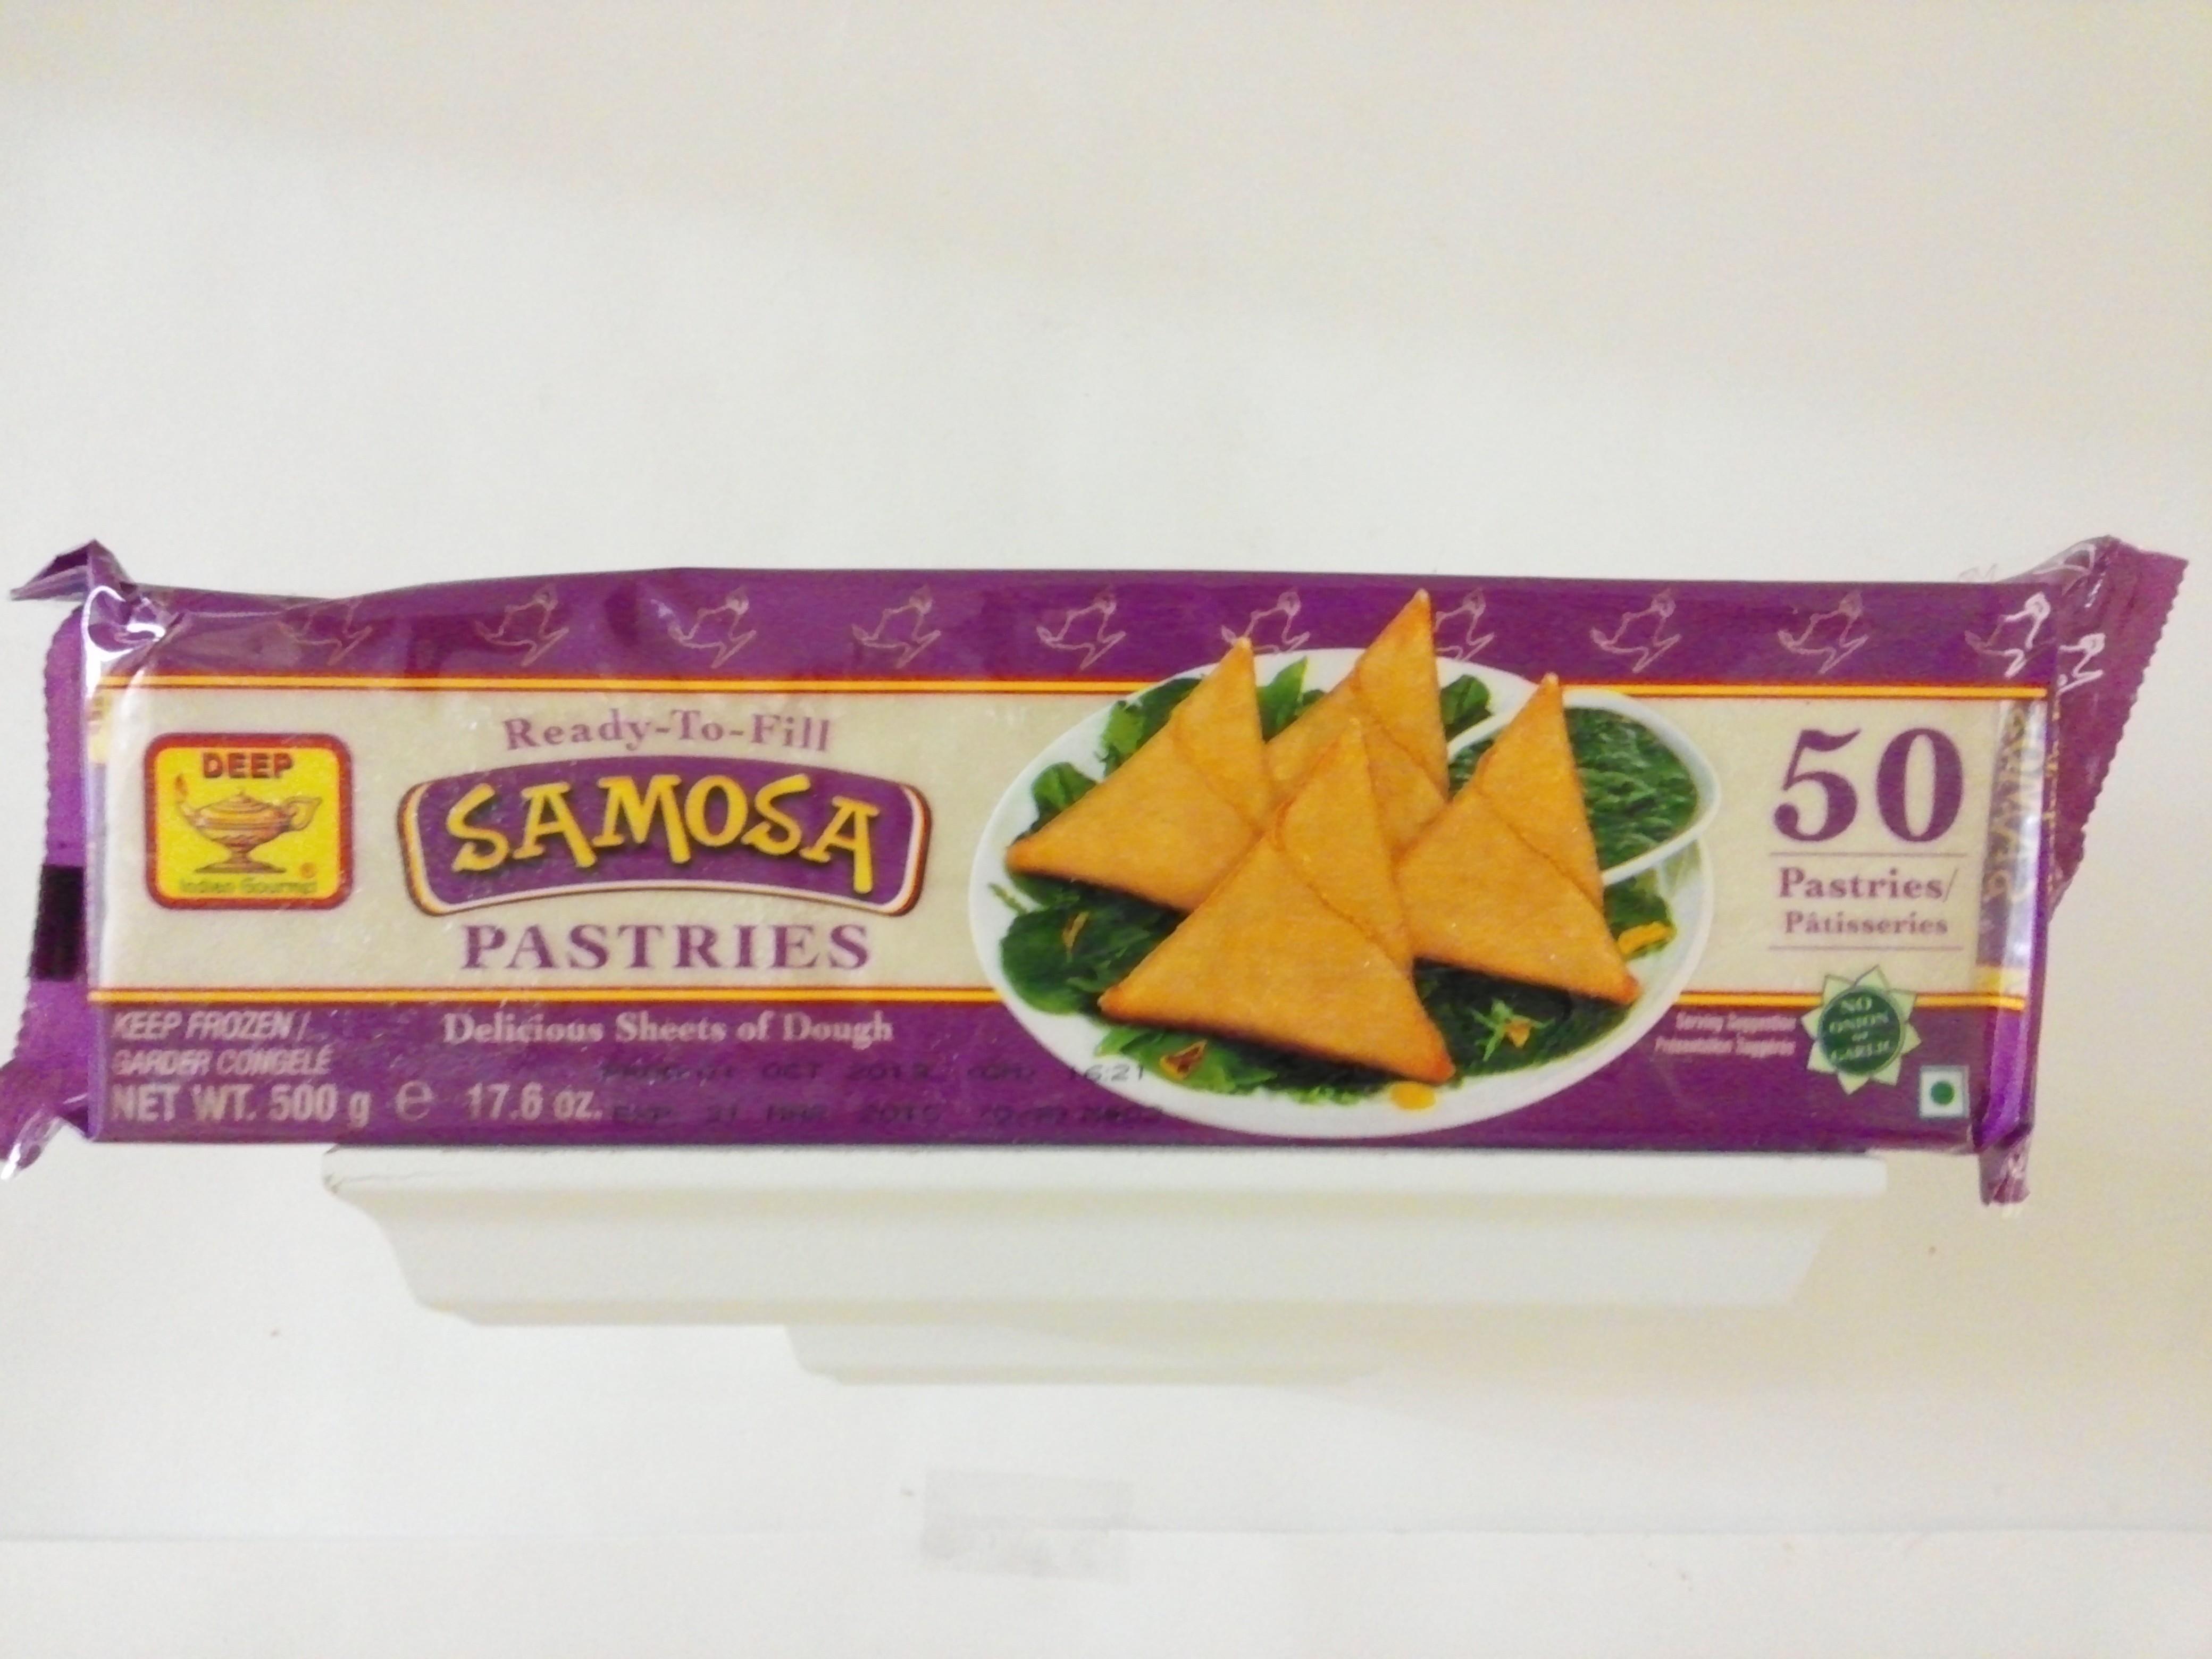 Deep's Samosa Pastries  50 pcs-17.6 oz